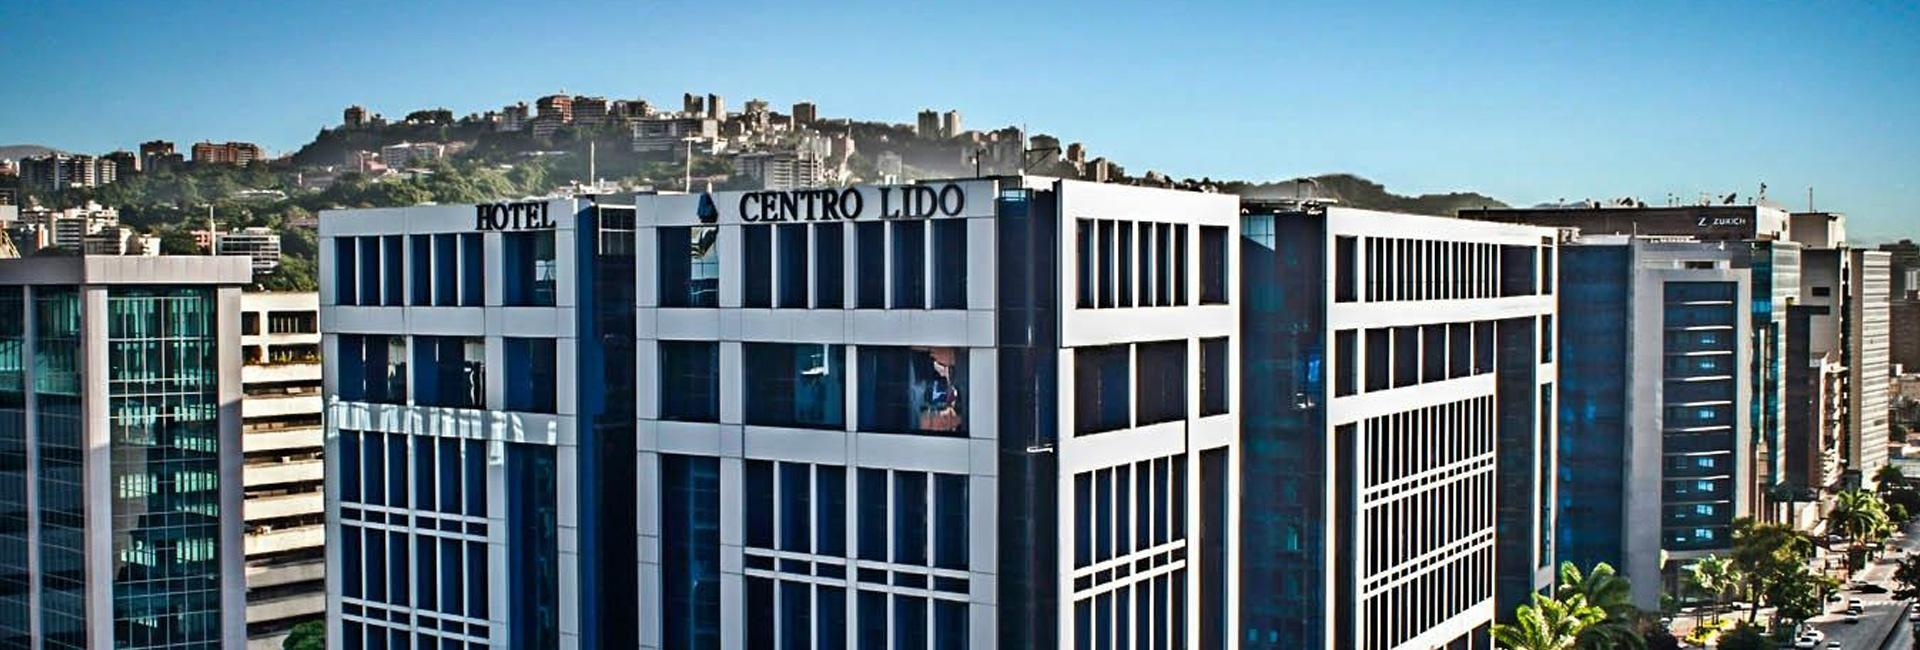 Lidotel Hotel Centro Lido, Libertador